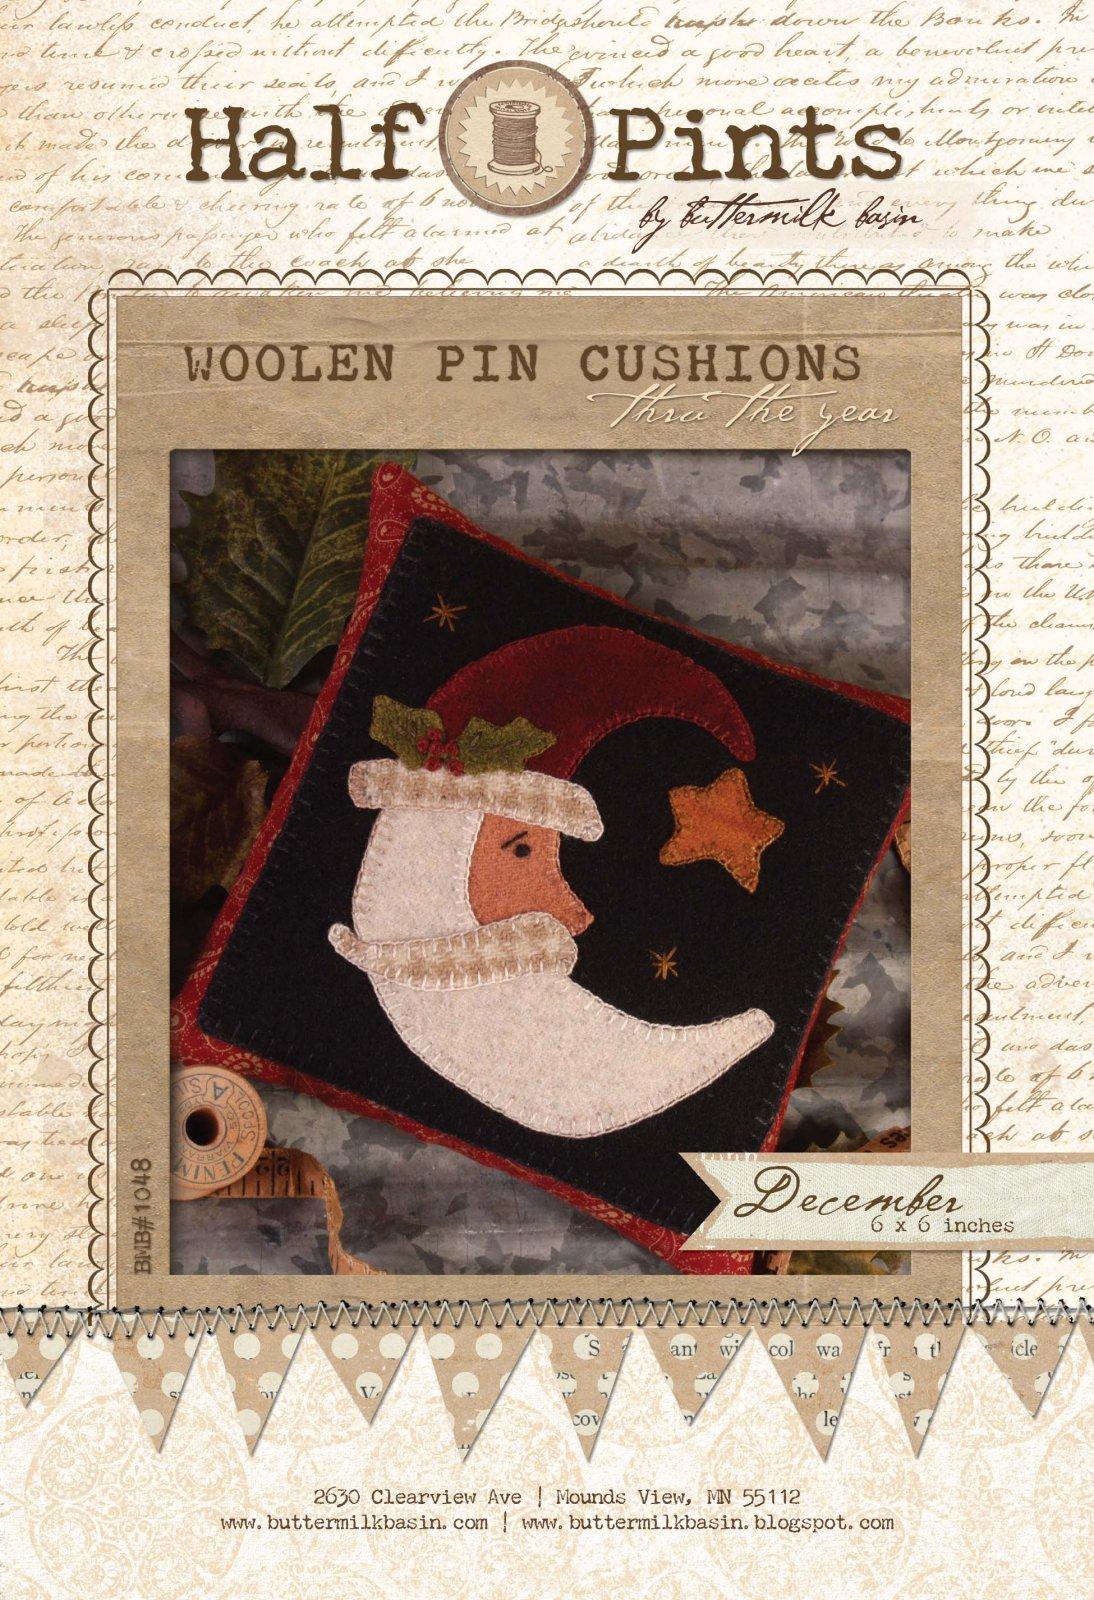 Woolen Pin Cushion - Dec.